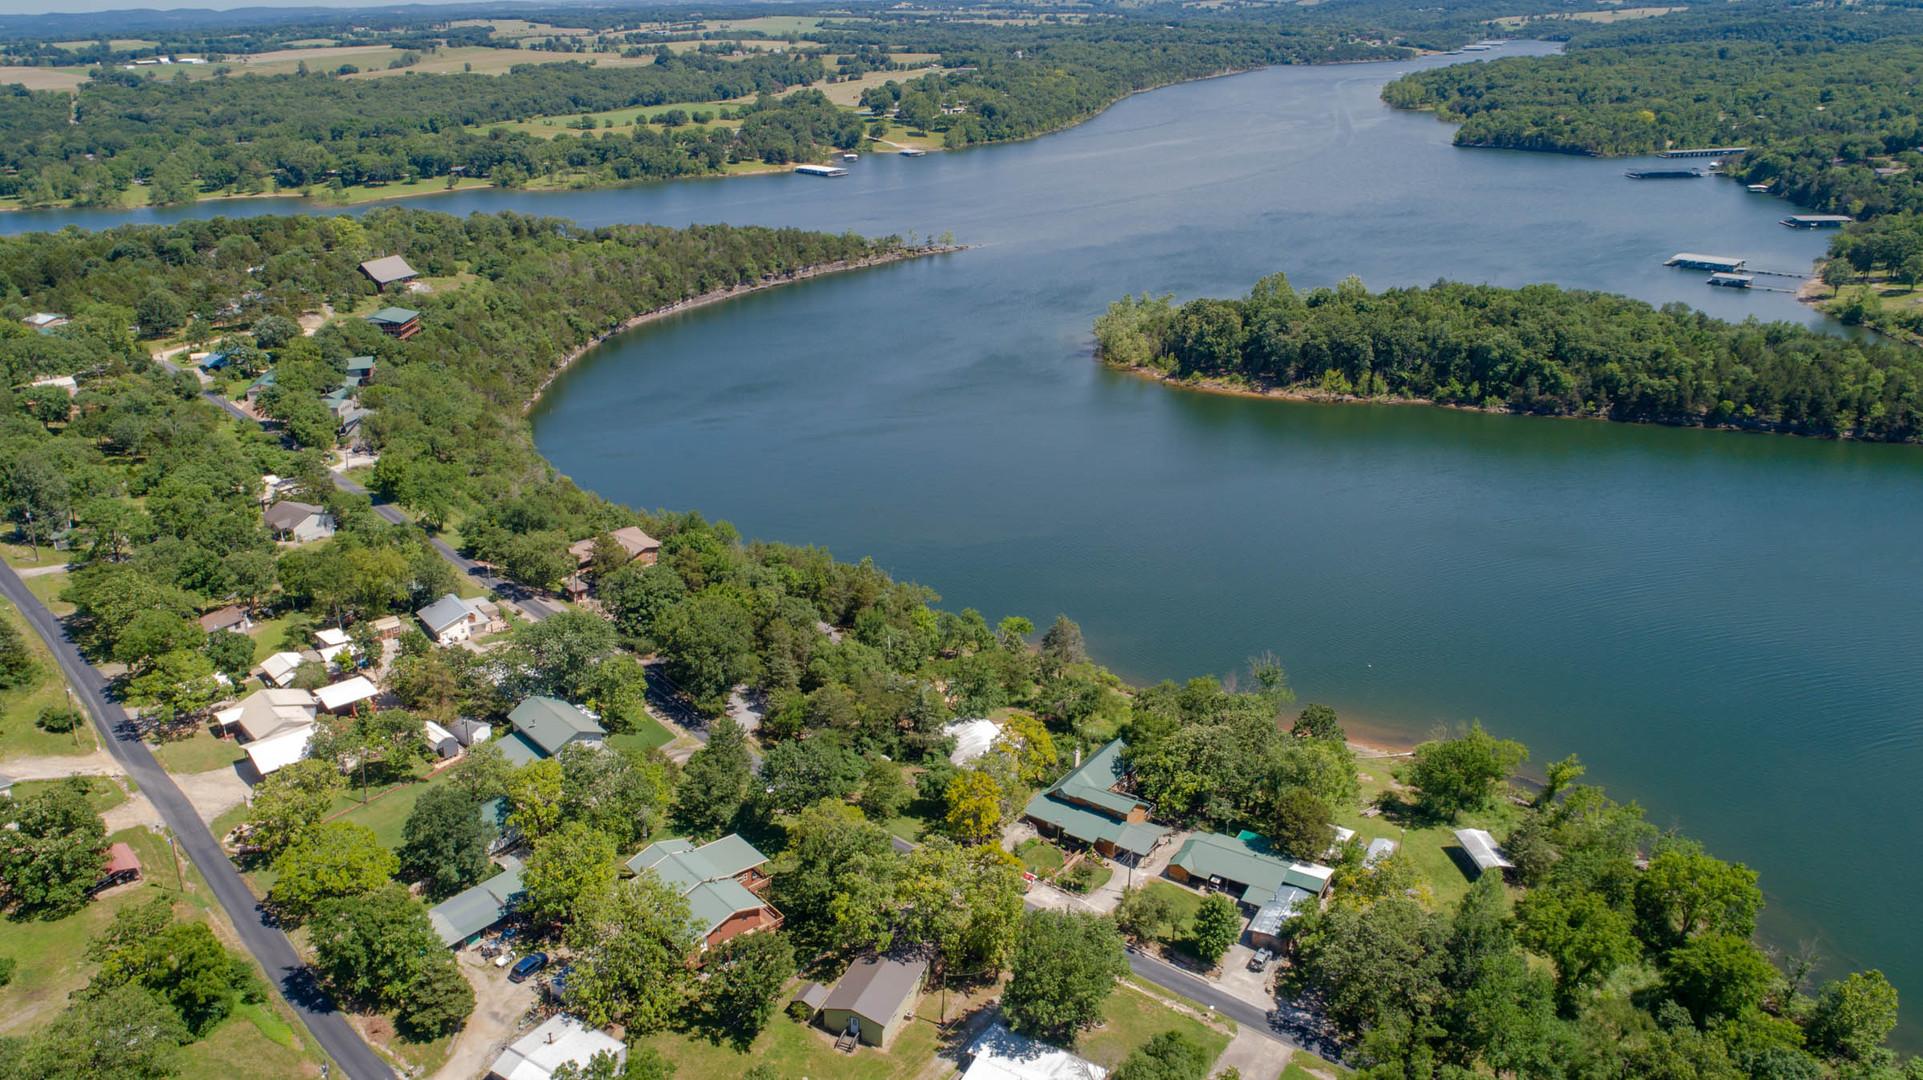 Dan Holt Drone 21533 Rock Creek Cove 5.j